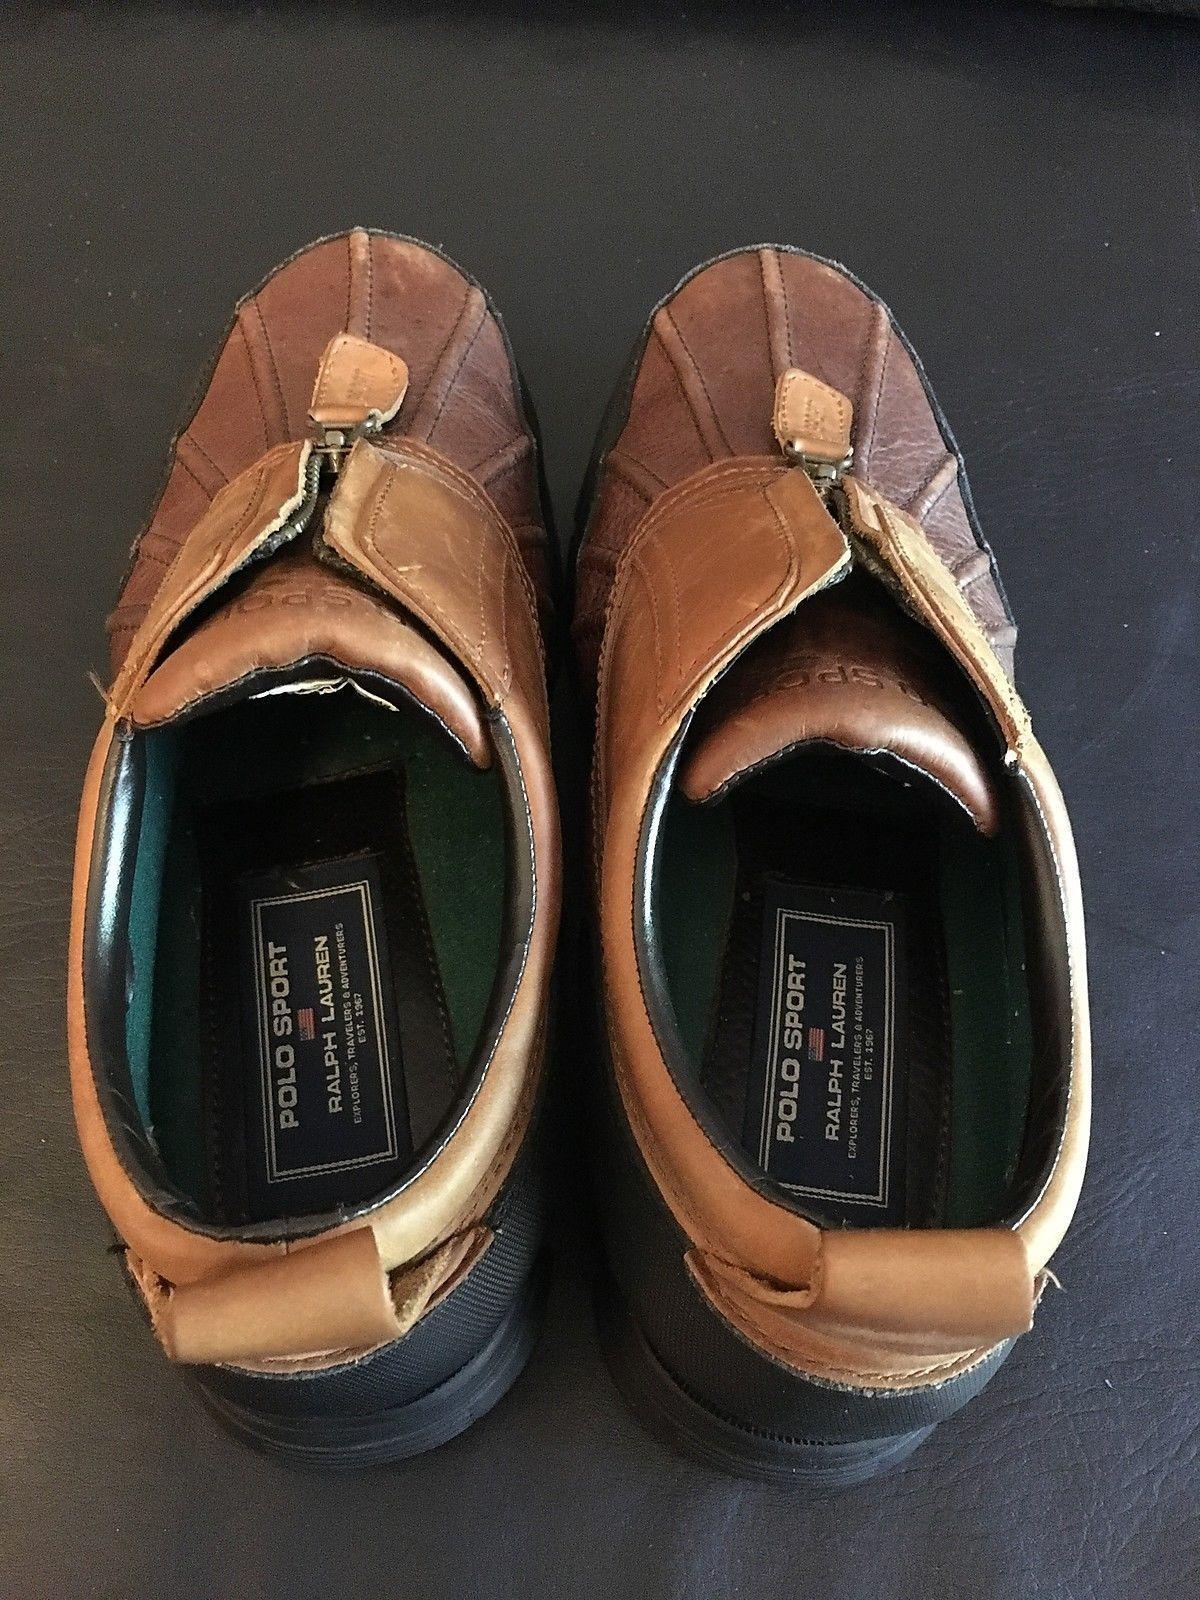 Ralph Lauren Shoes Review